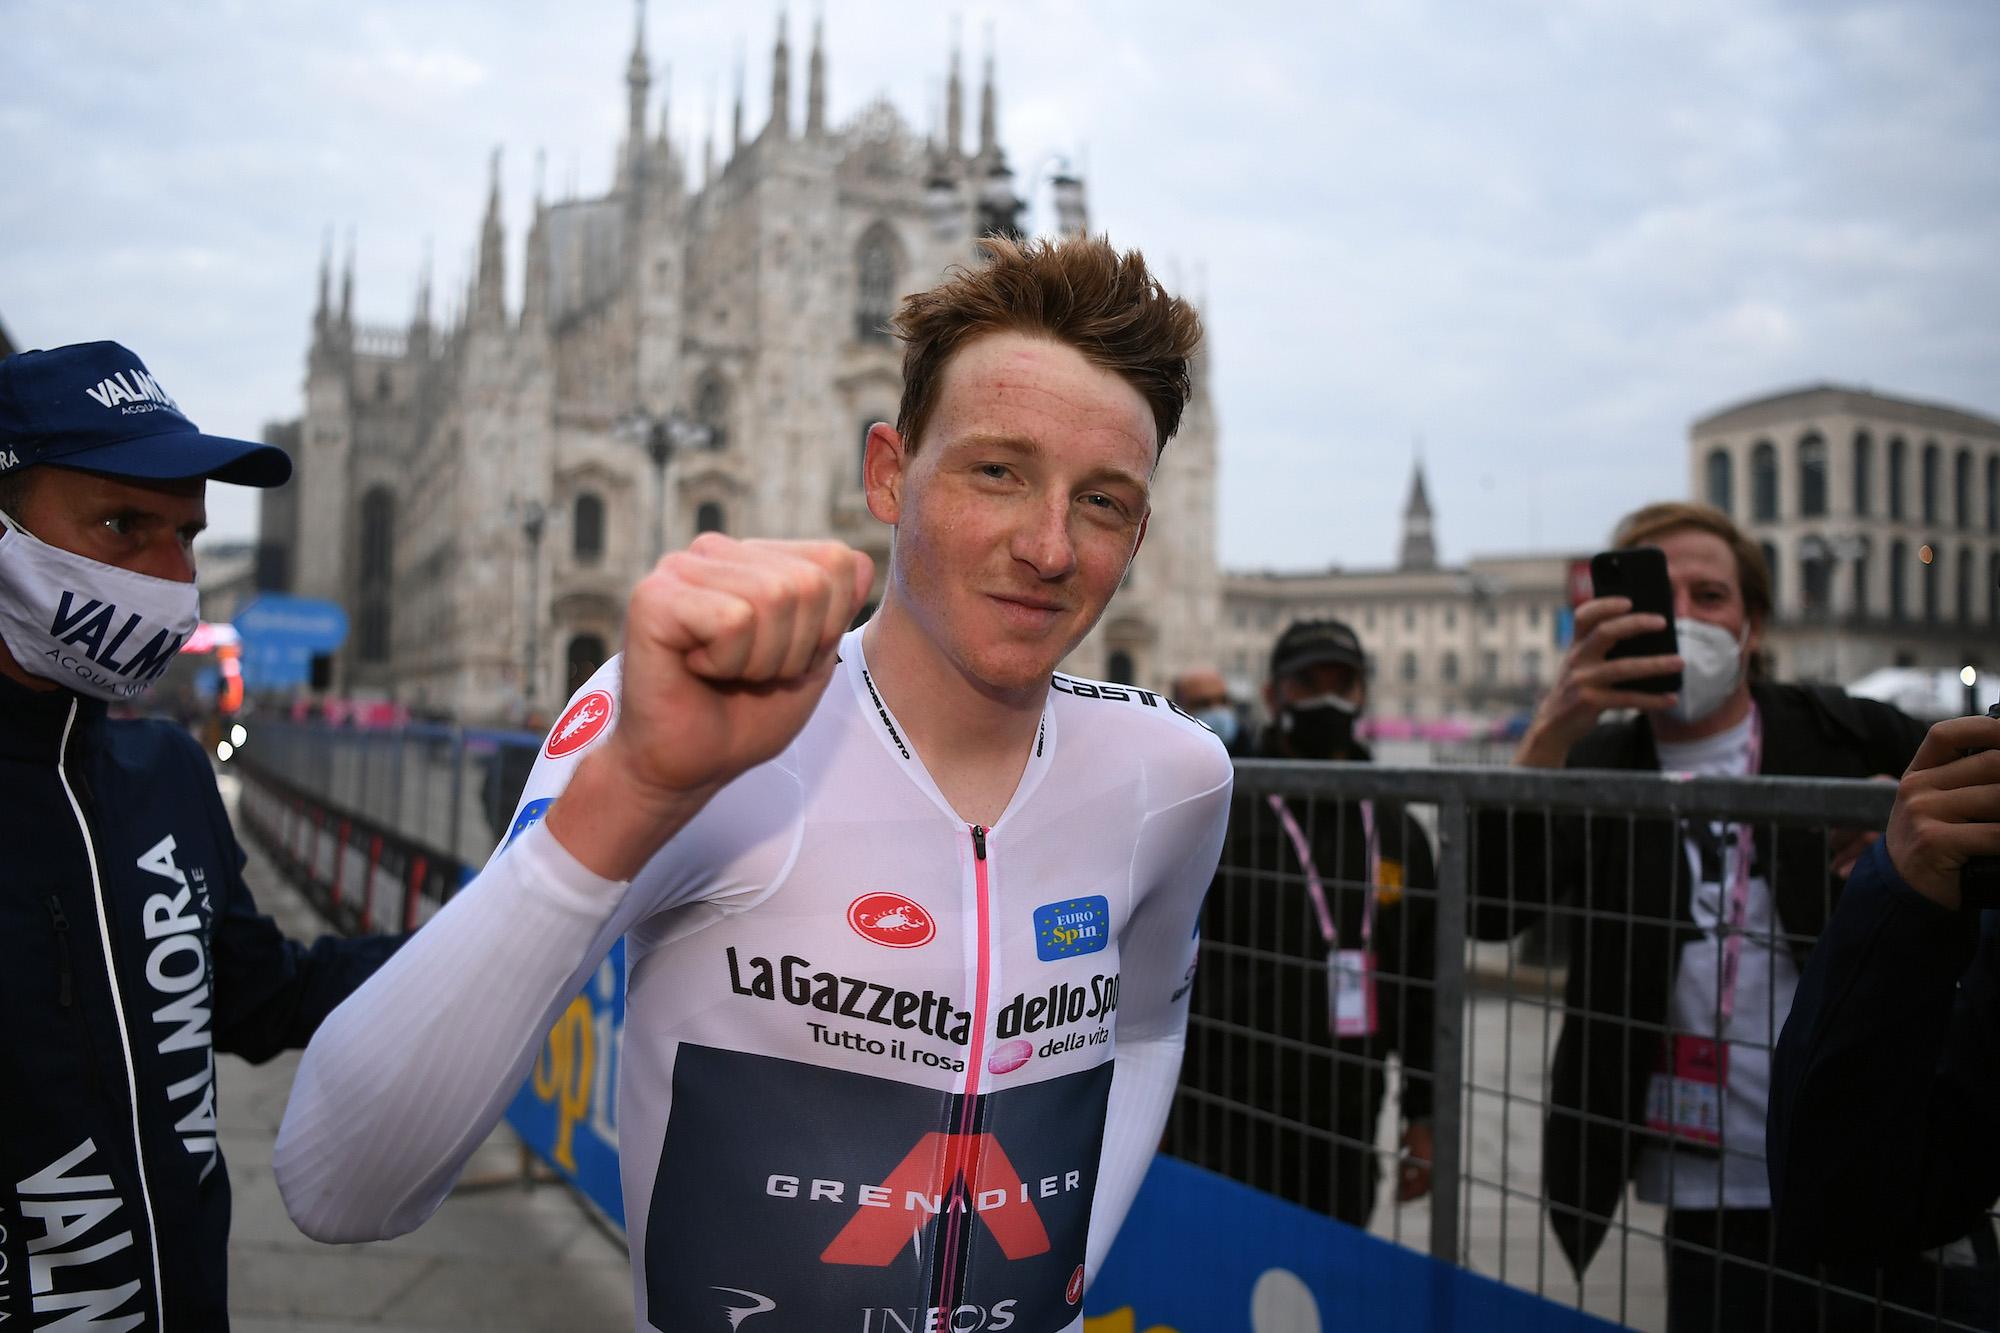 Tao Geoghegan Hart will ride Tour de France over Giro d'Italia this season